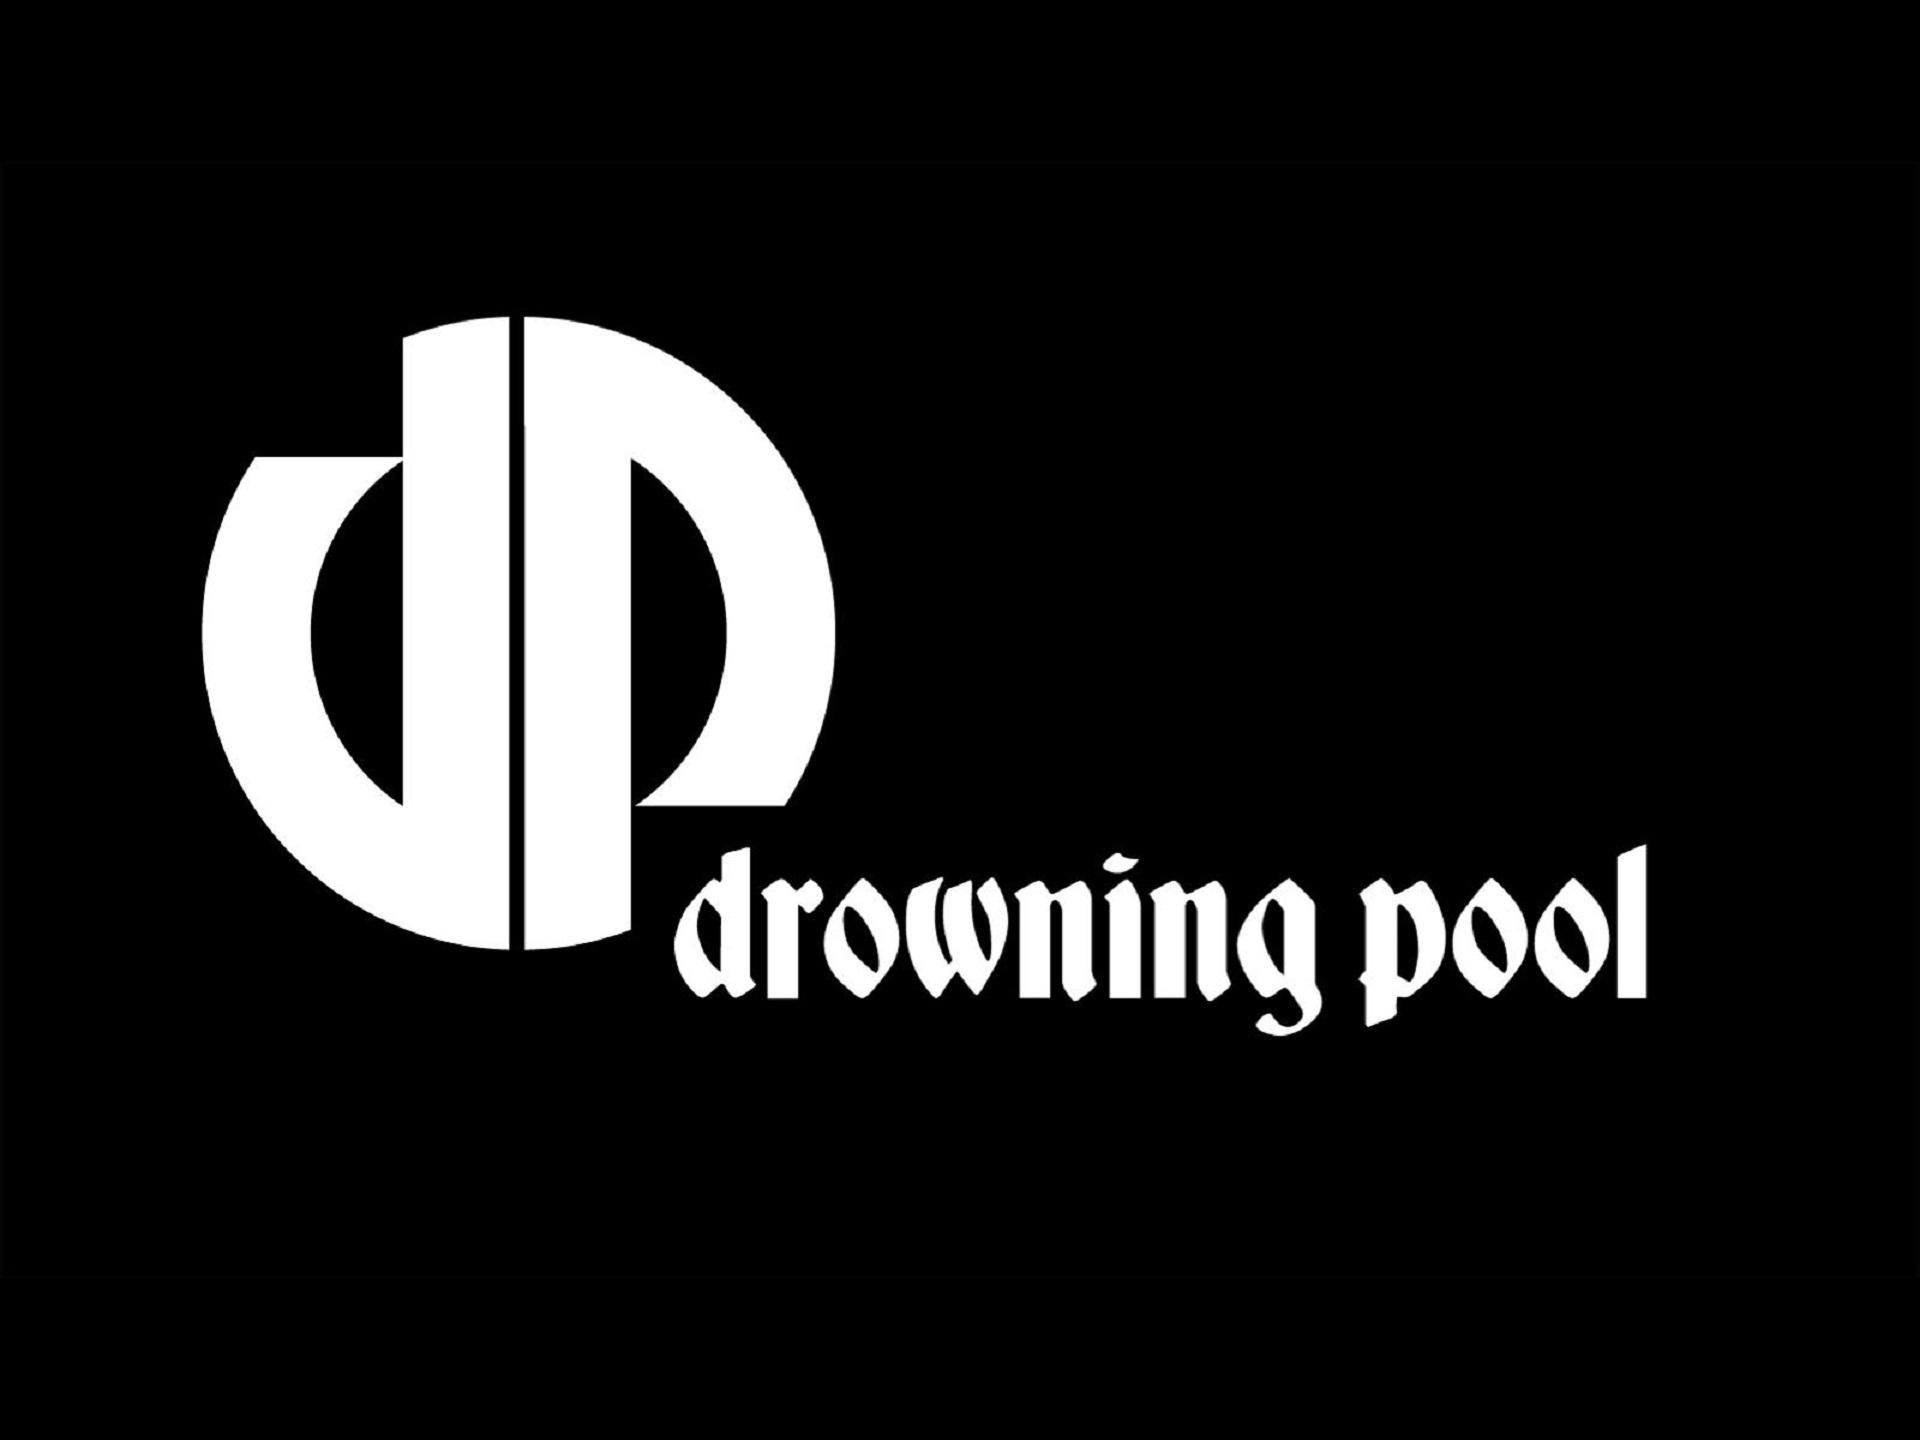 Drowning Pool Wallpaper